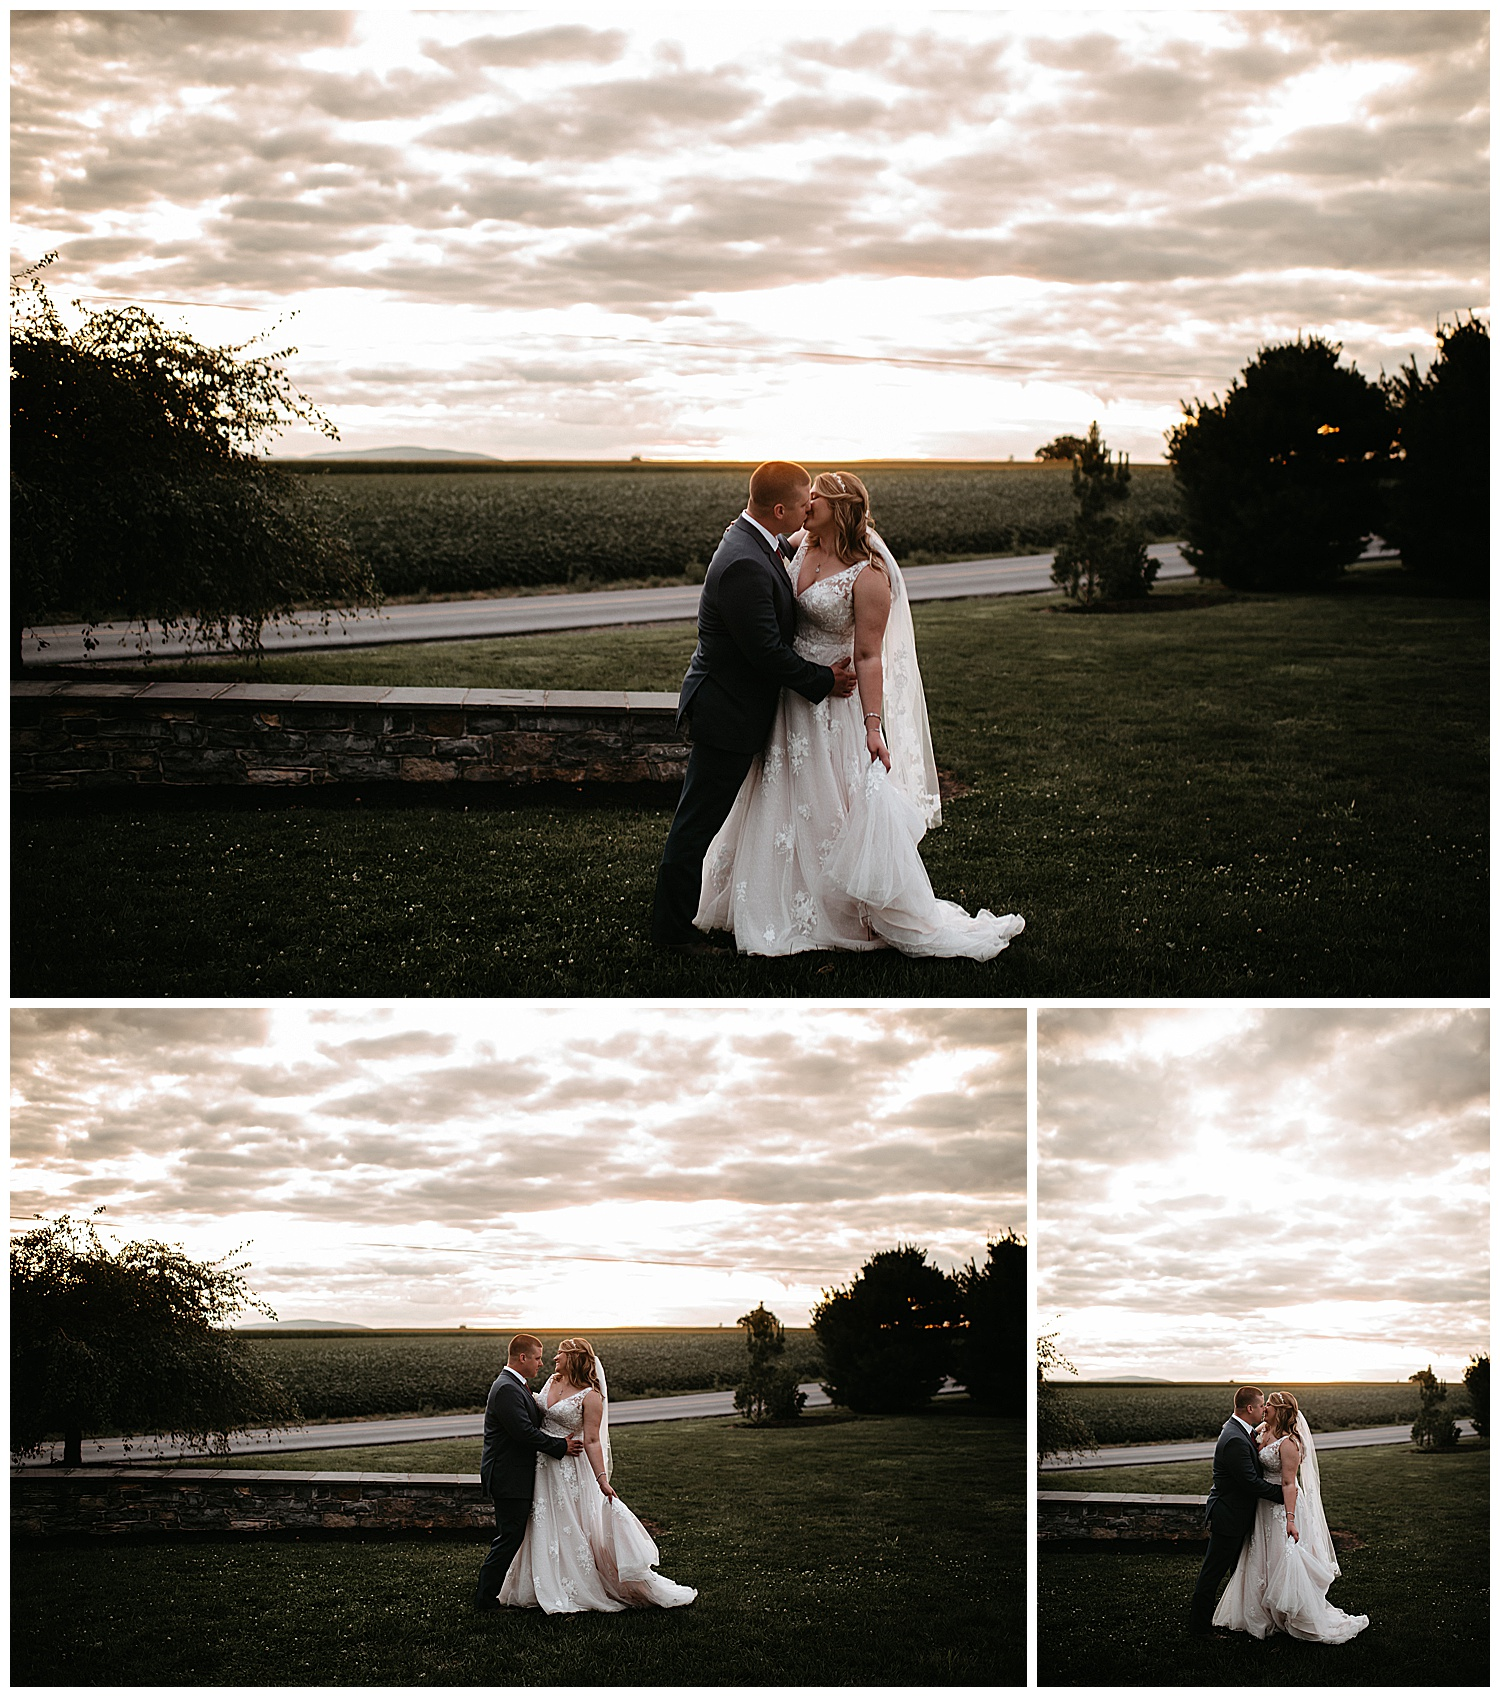 NEPA-Bloomgsburg-Wedding-Photographer-at-The-Barn-at-Greystone-Farms-Watsontown-PA_0106.jpg